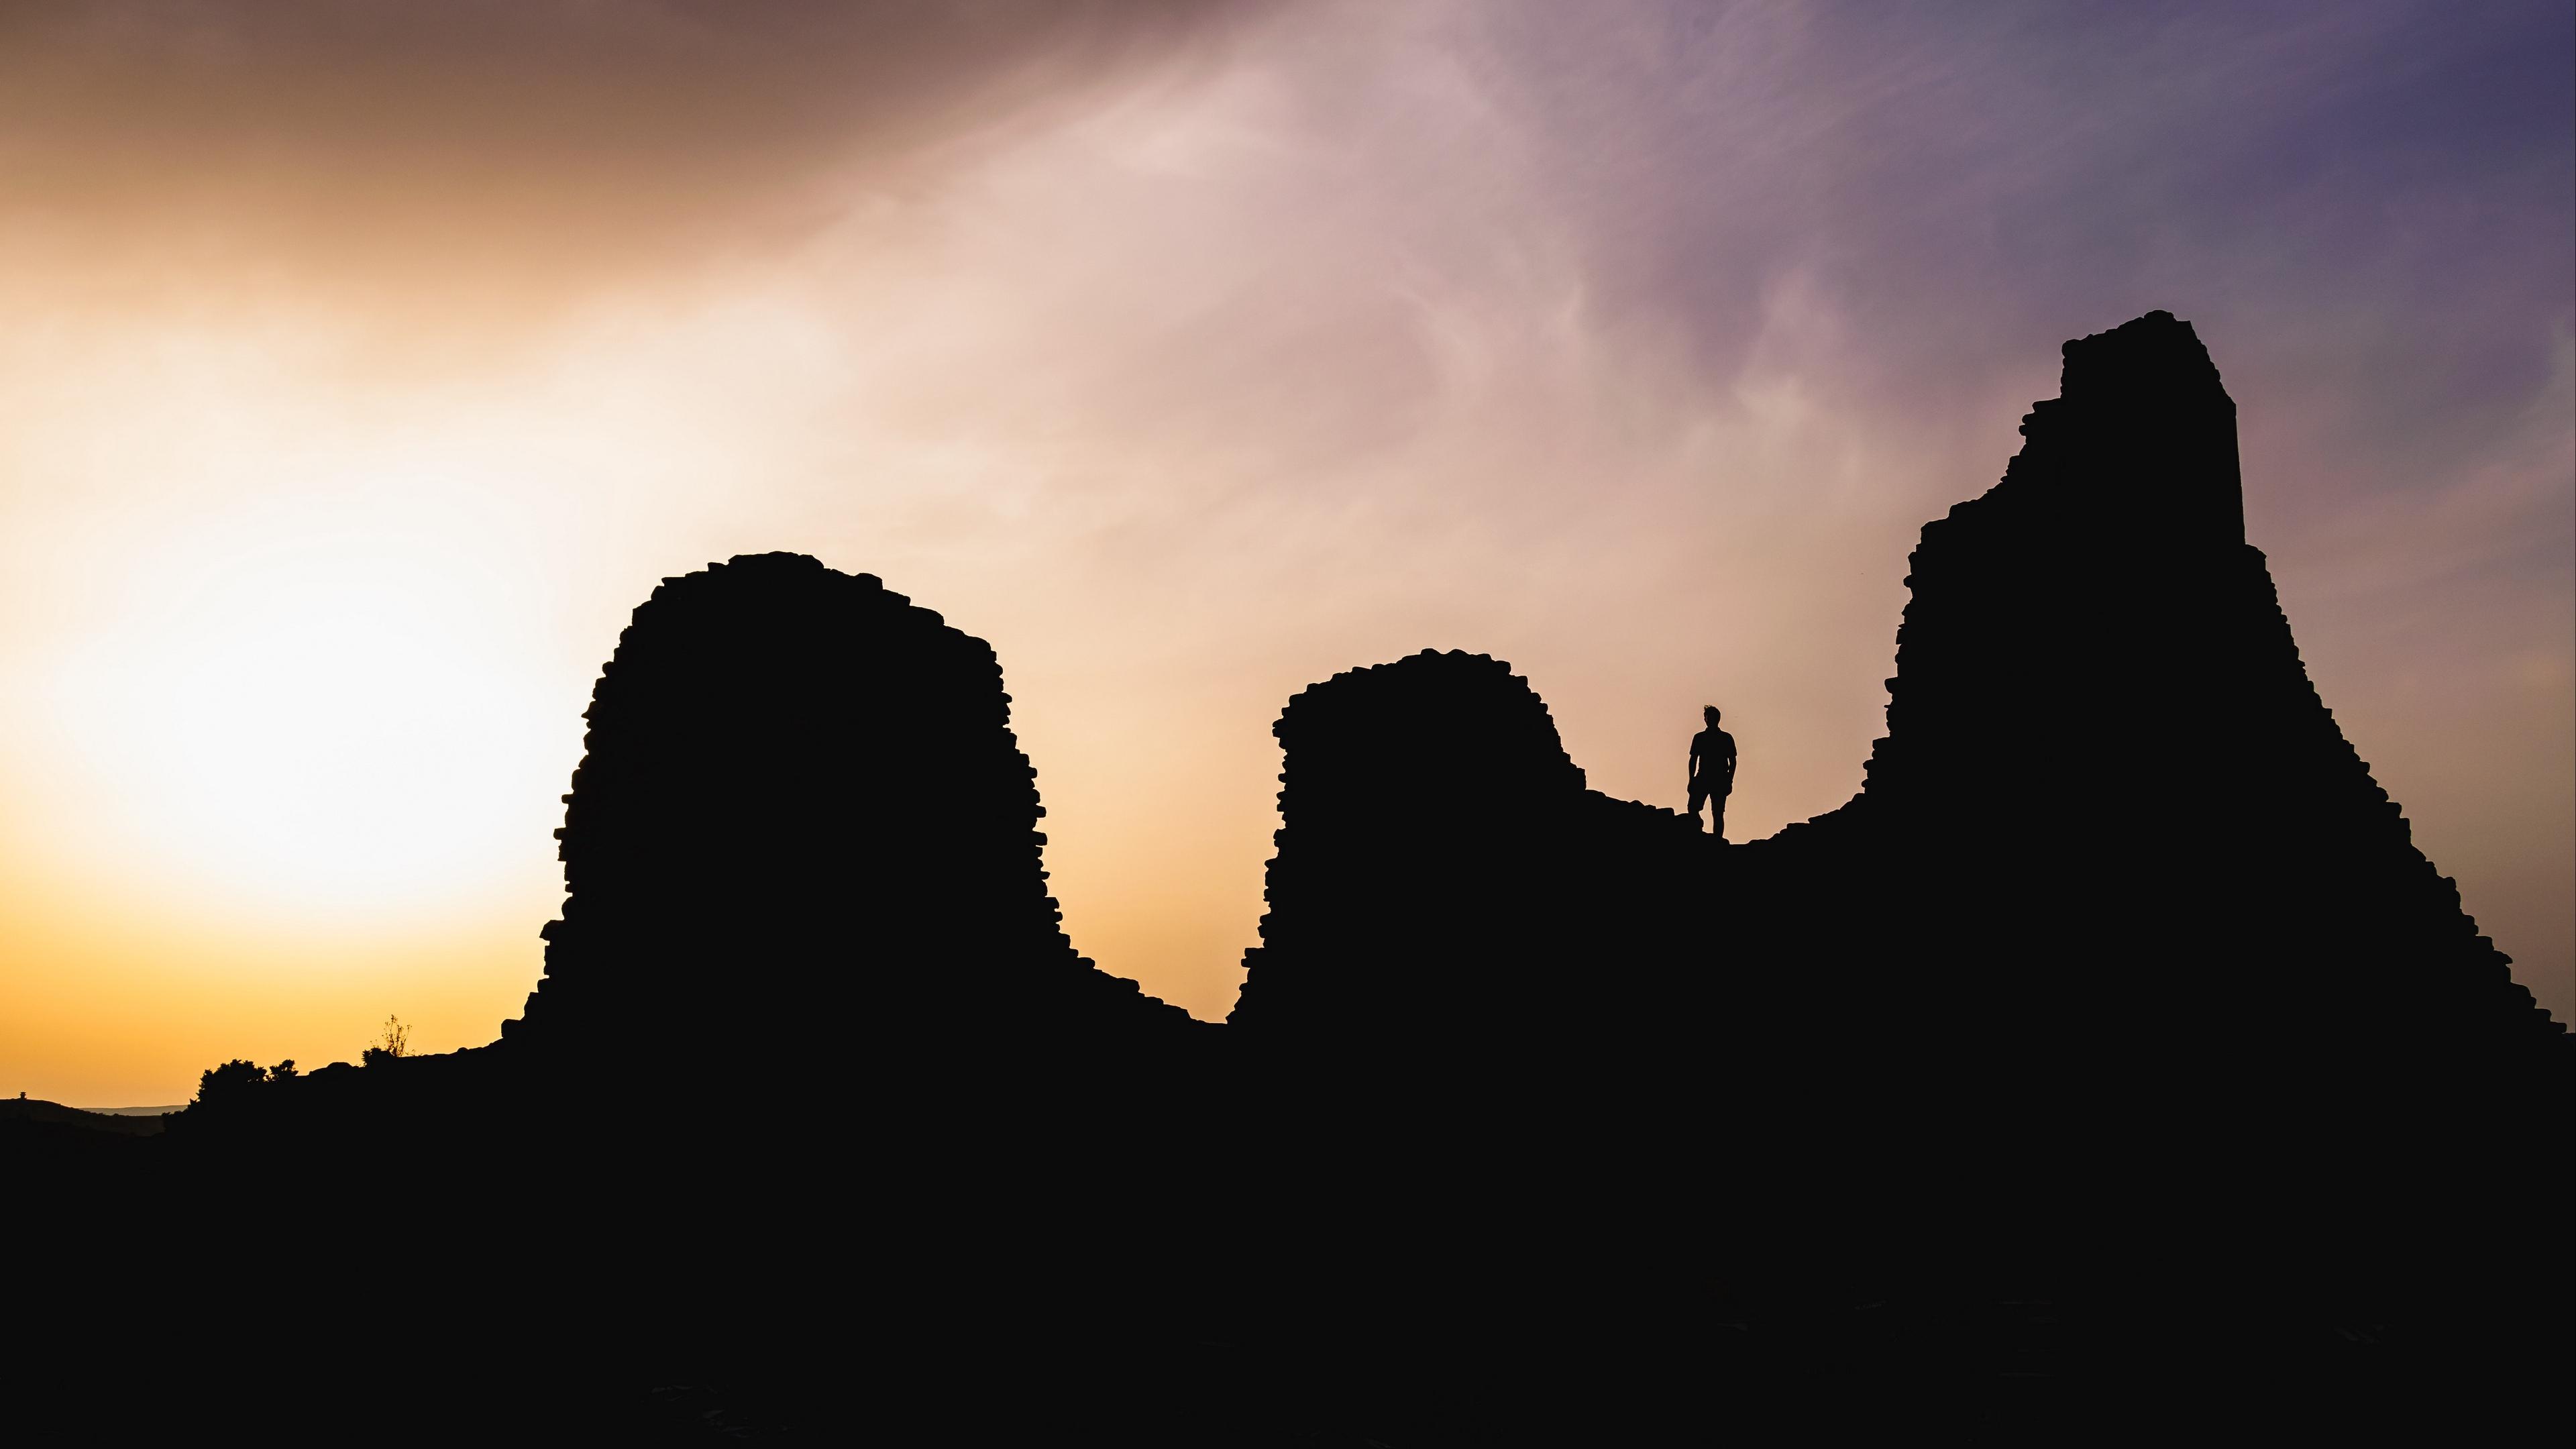 hills silhouette solitude sunset sardinia italy 4k 1540574875 - hills, silhouette, solitude, sunset, sardinia, italy 4k - solitude, Silhouette, Hills